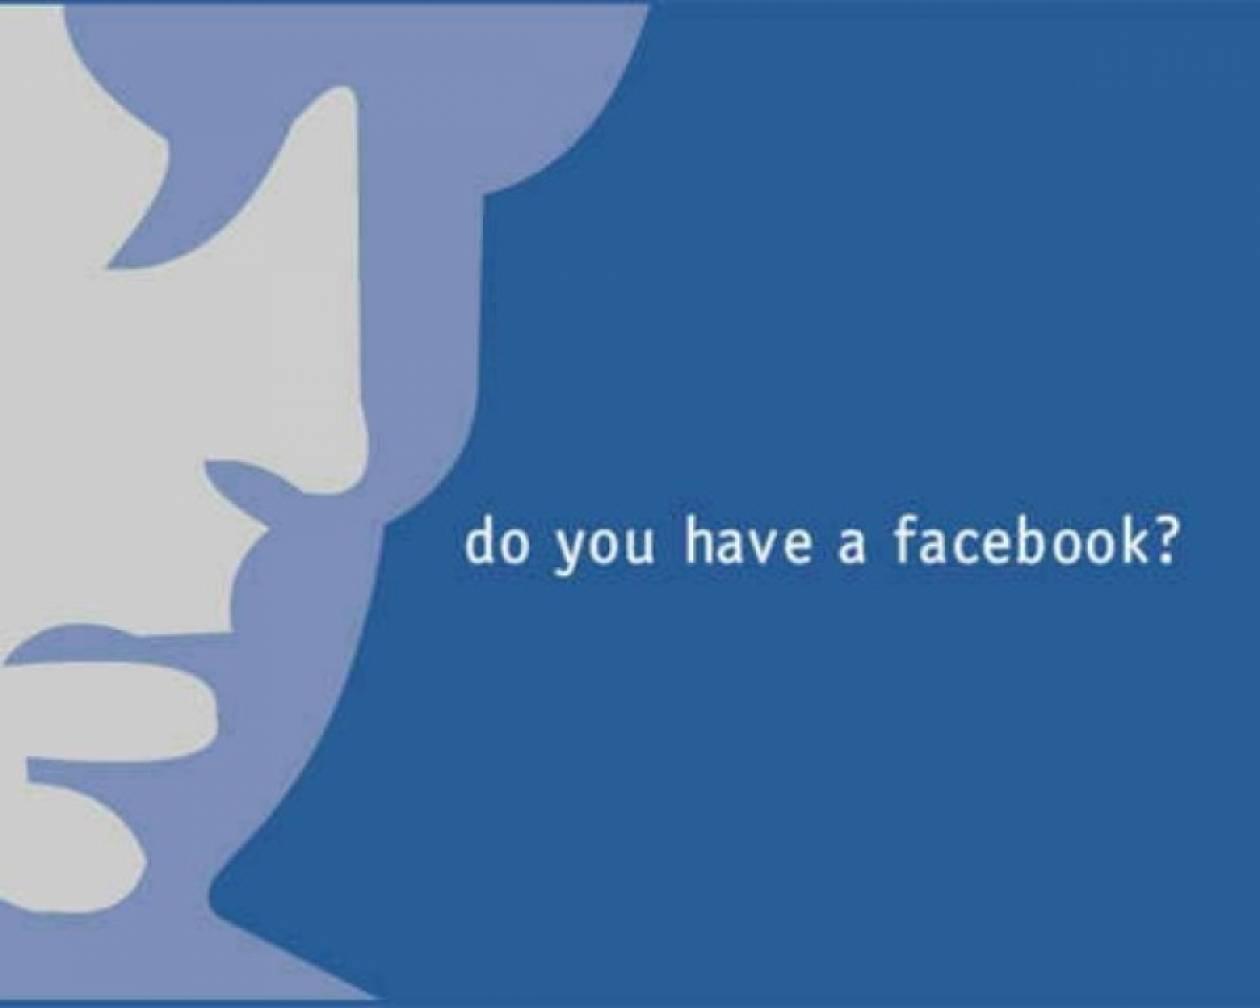 To status για τα Χριστούγεννα που έχει κατακλύσει το Facebook